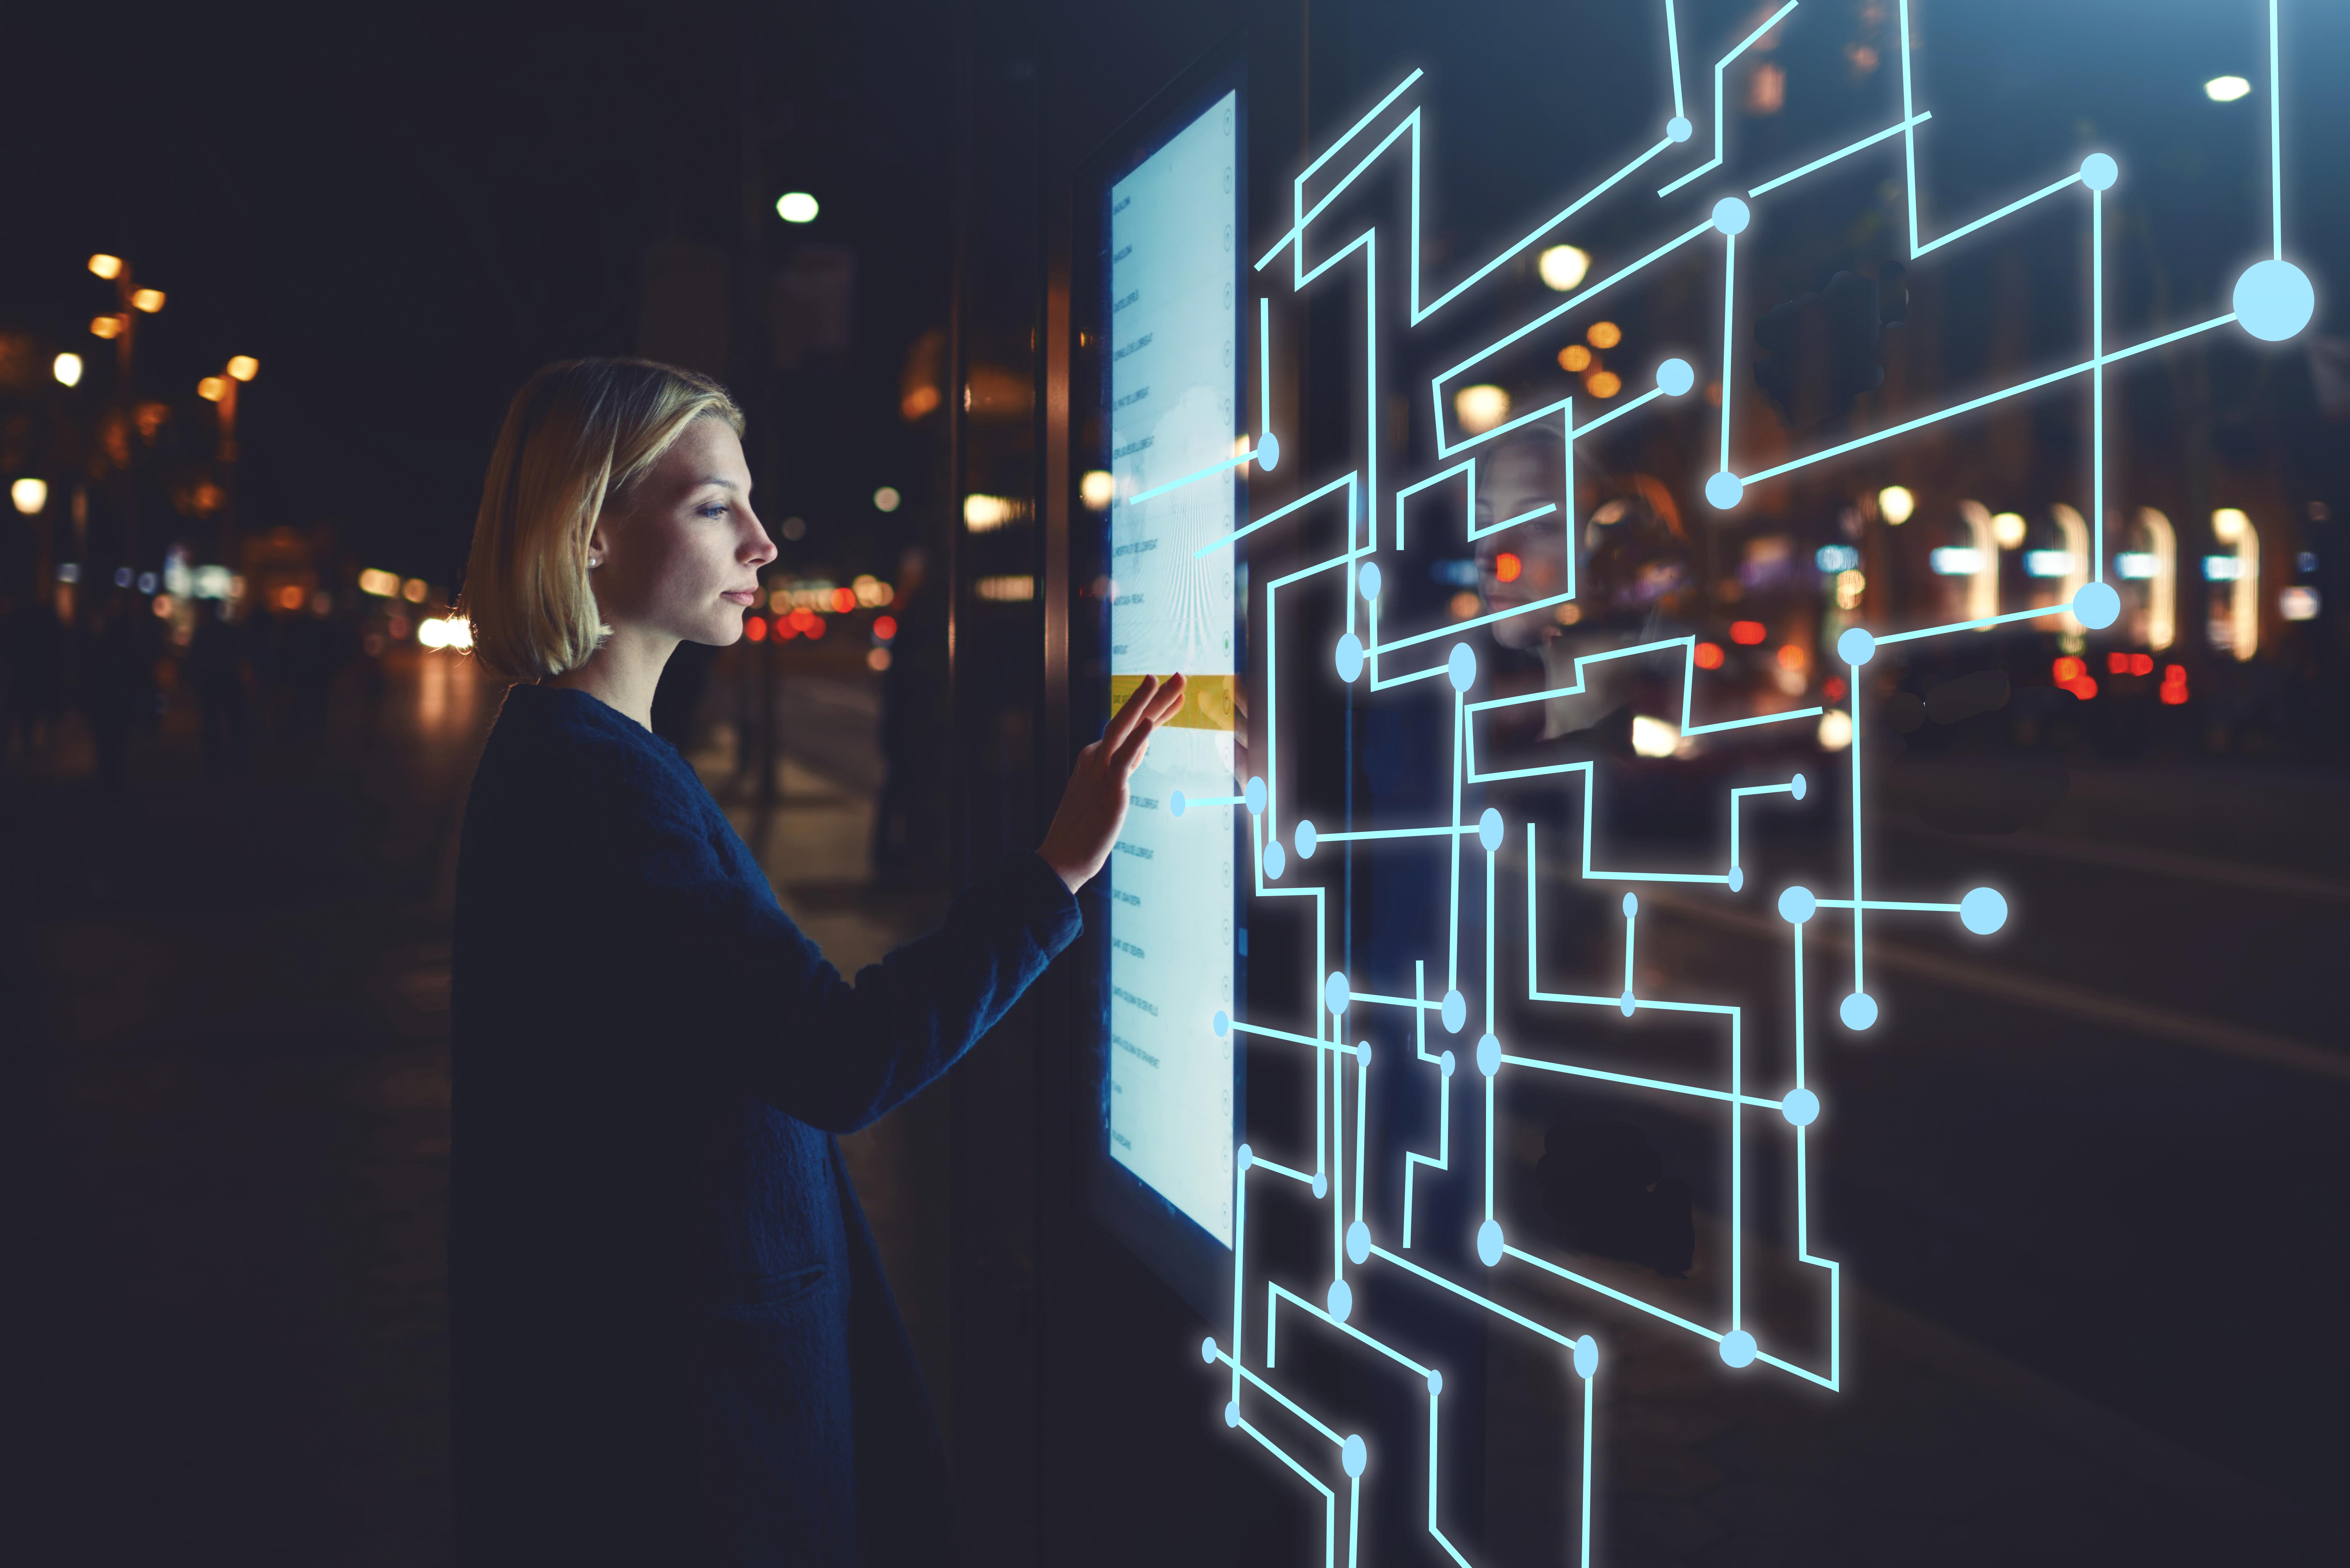 Digital Transformation is it trends?